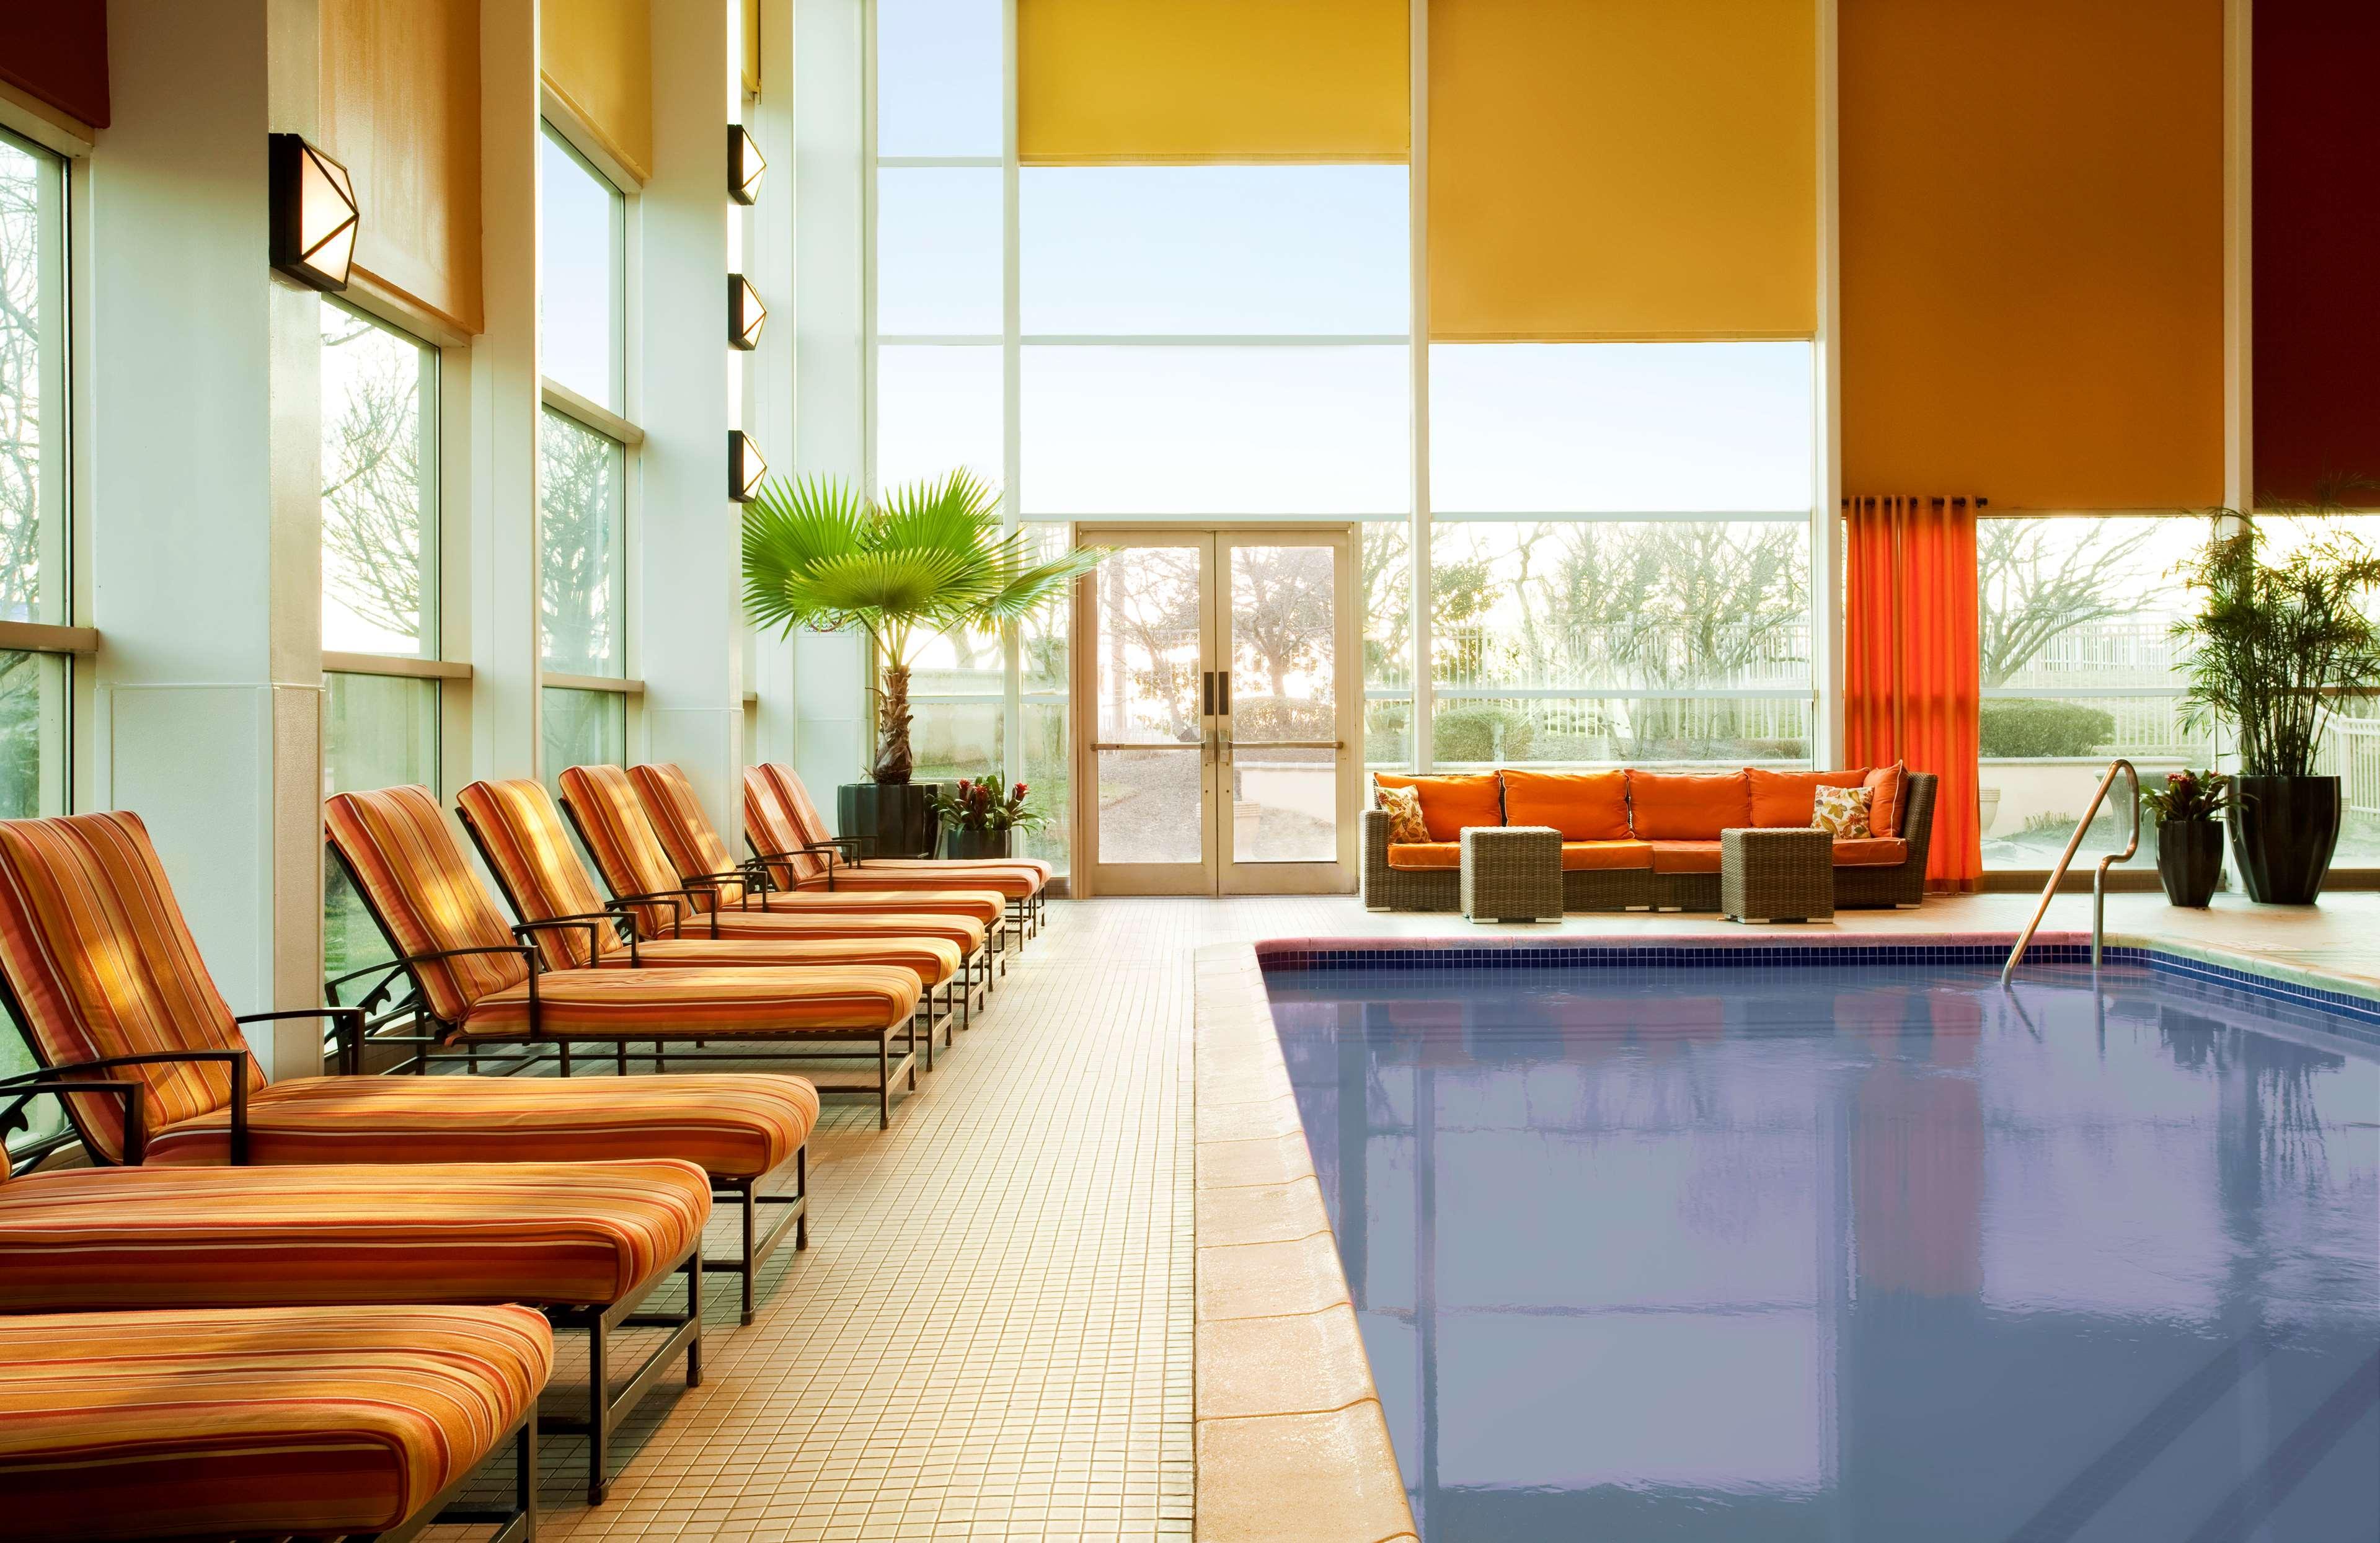 Sheraton Atlantic City Convention Center Hotel image 4